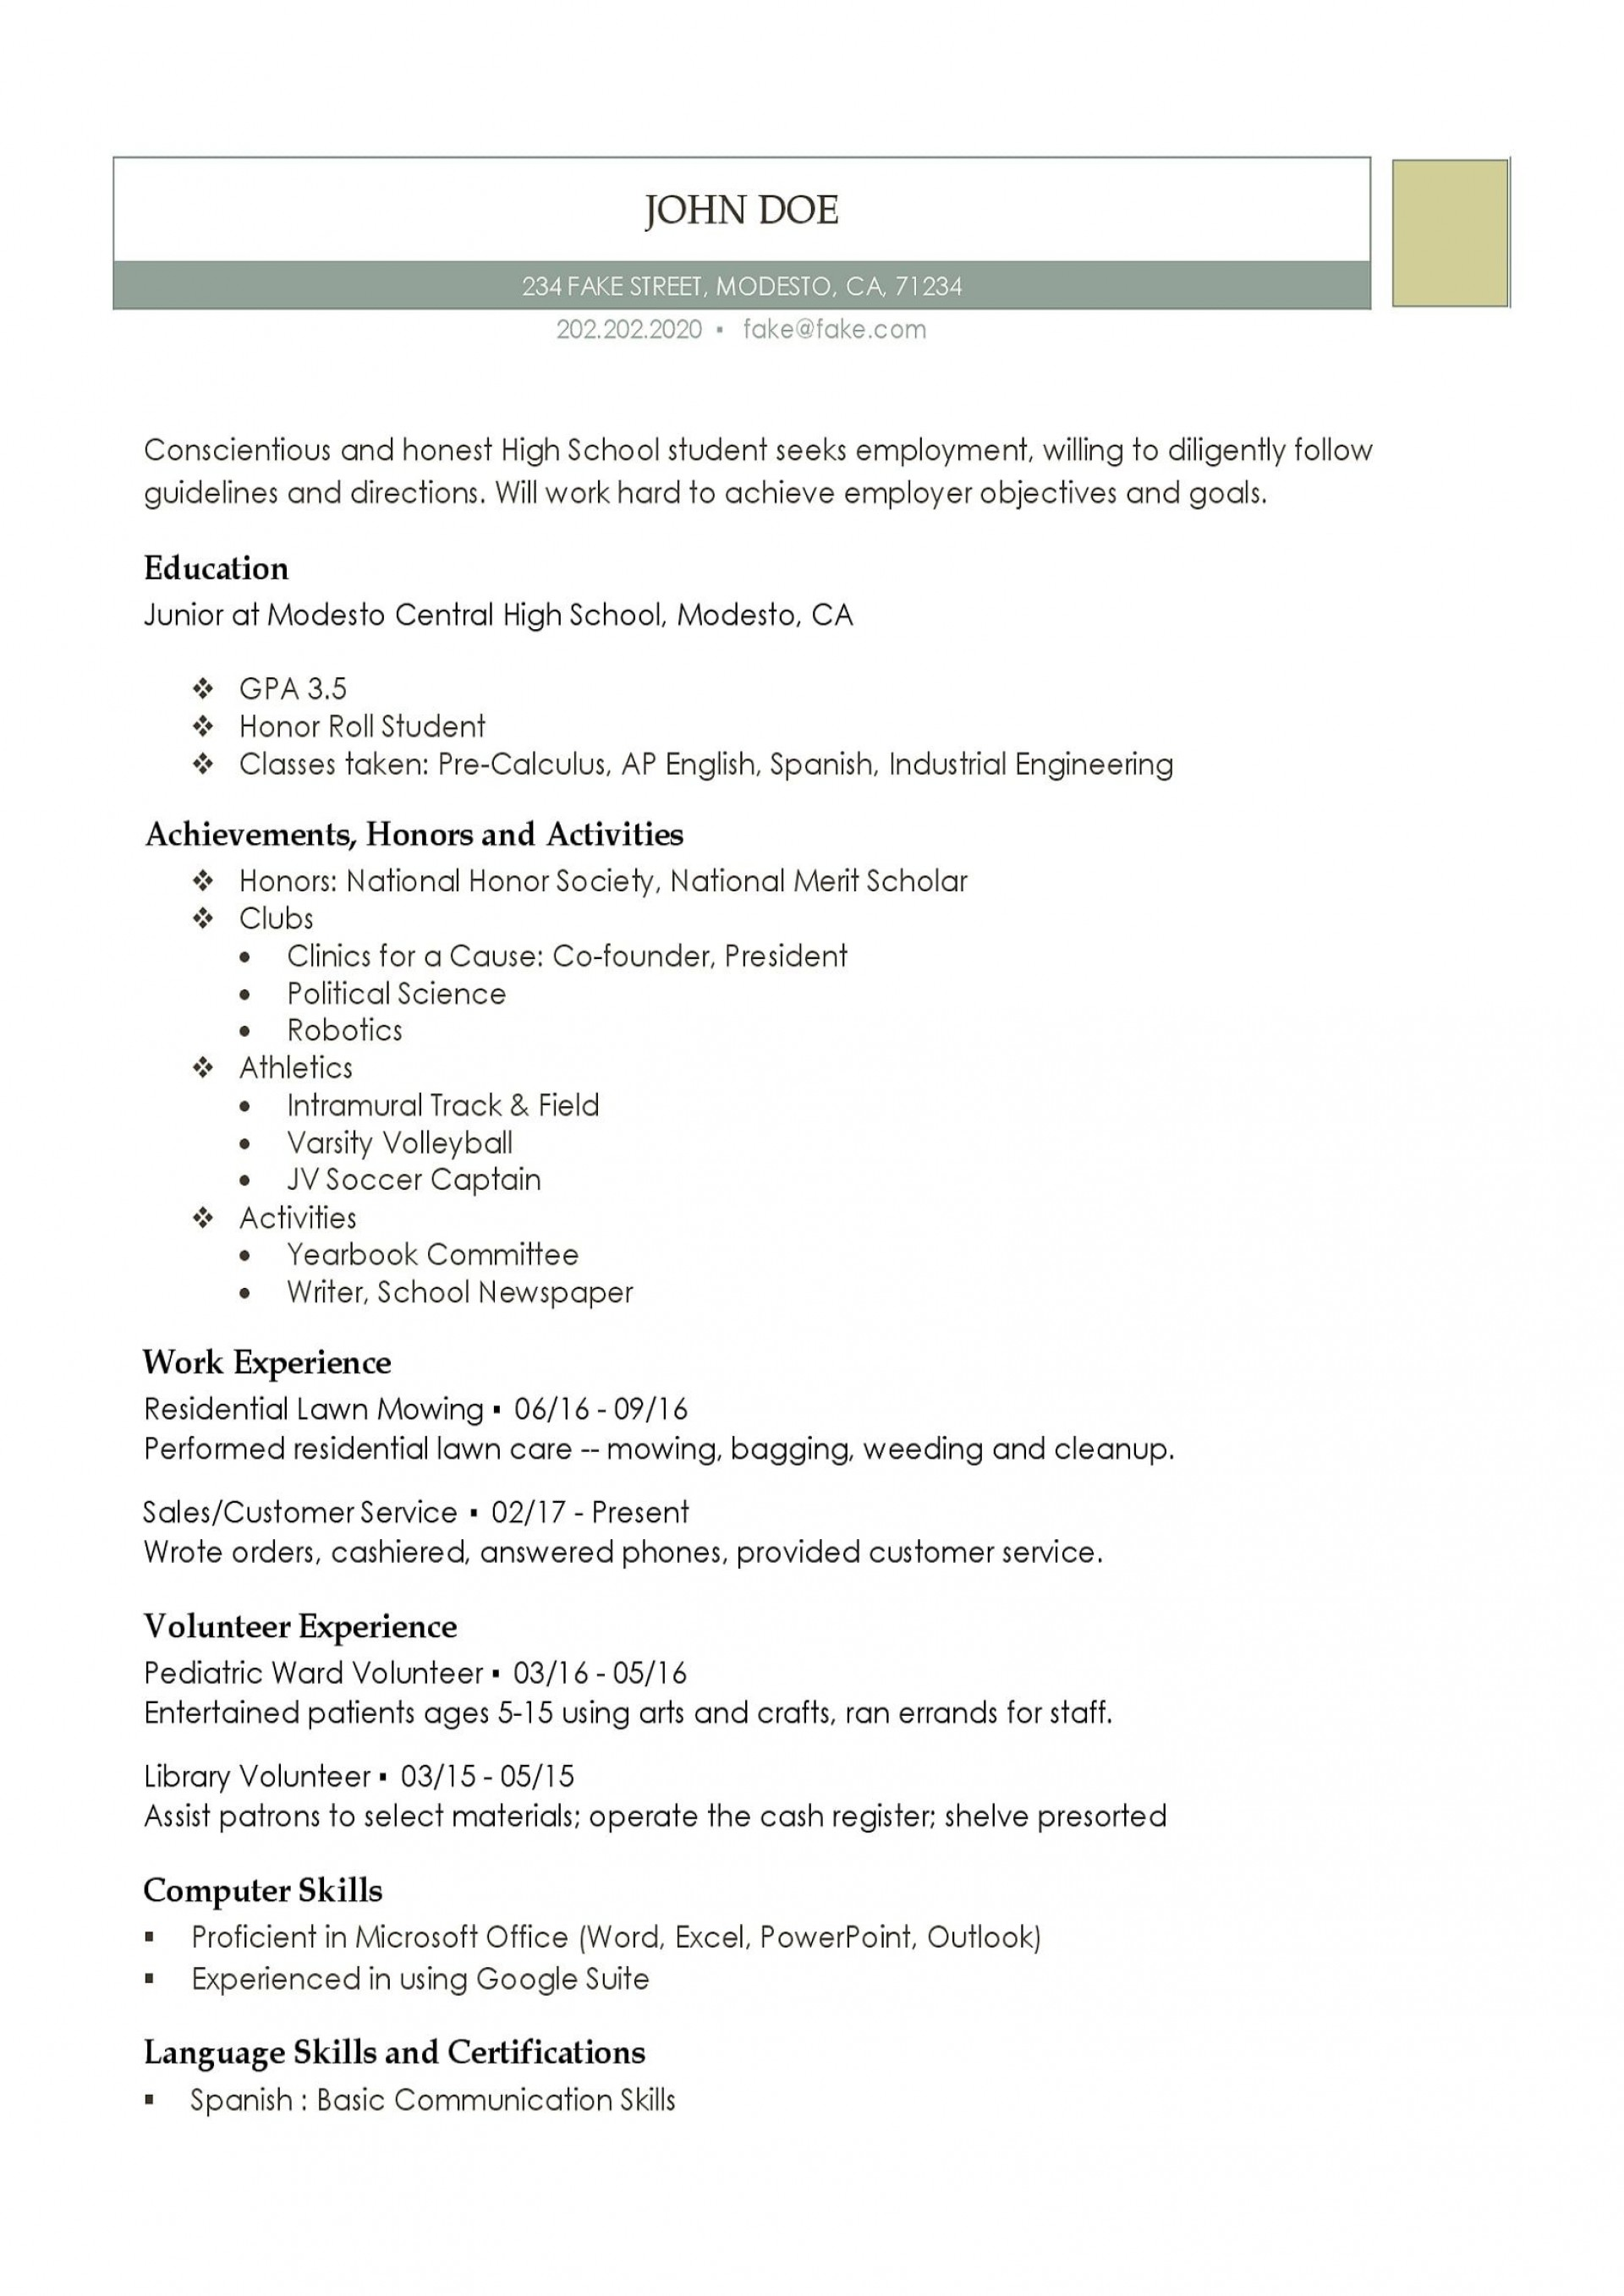 003 Unusual Free High School Graduate Resume Template Definition  Templates1920